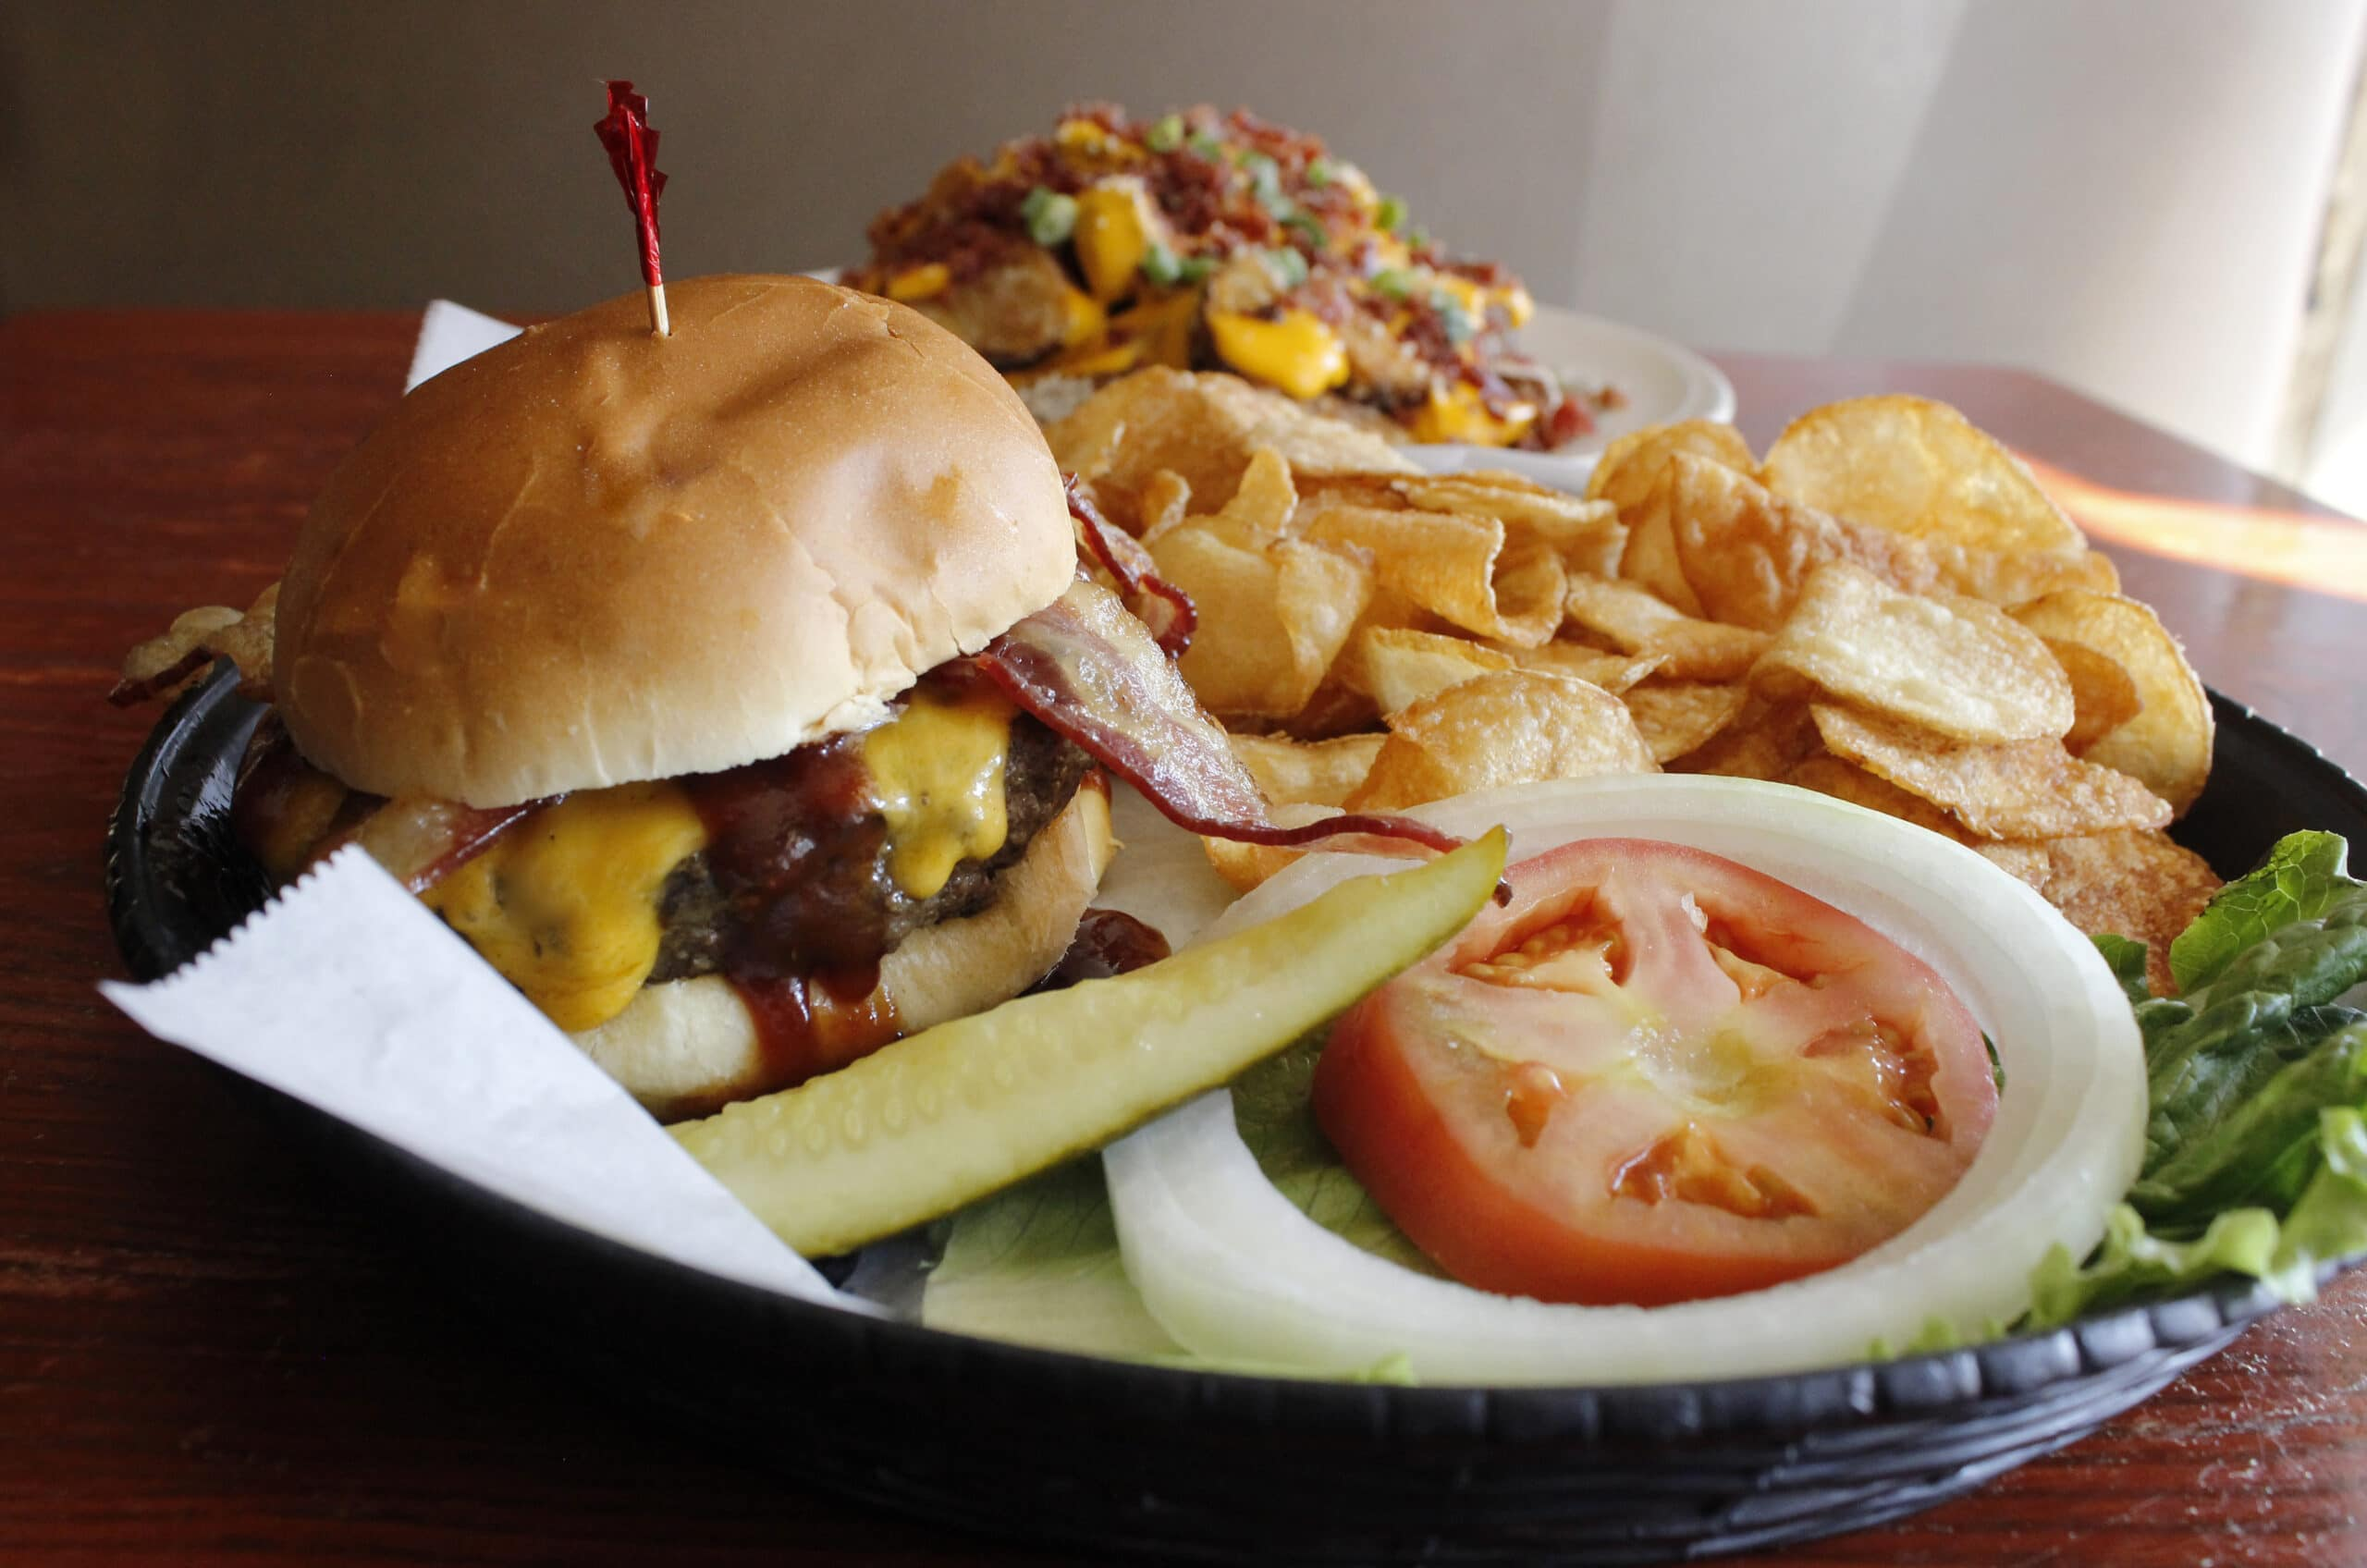 burgers in kenosha, kaiser's of kenosha, bar & grill in kenosha